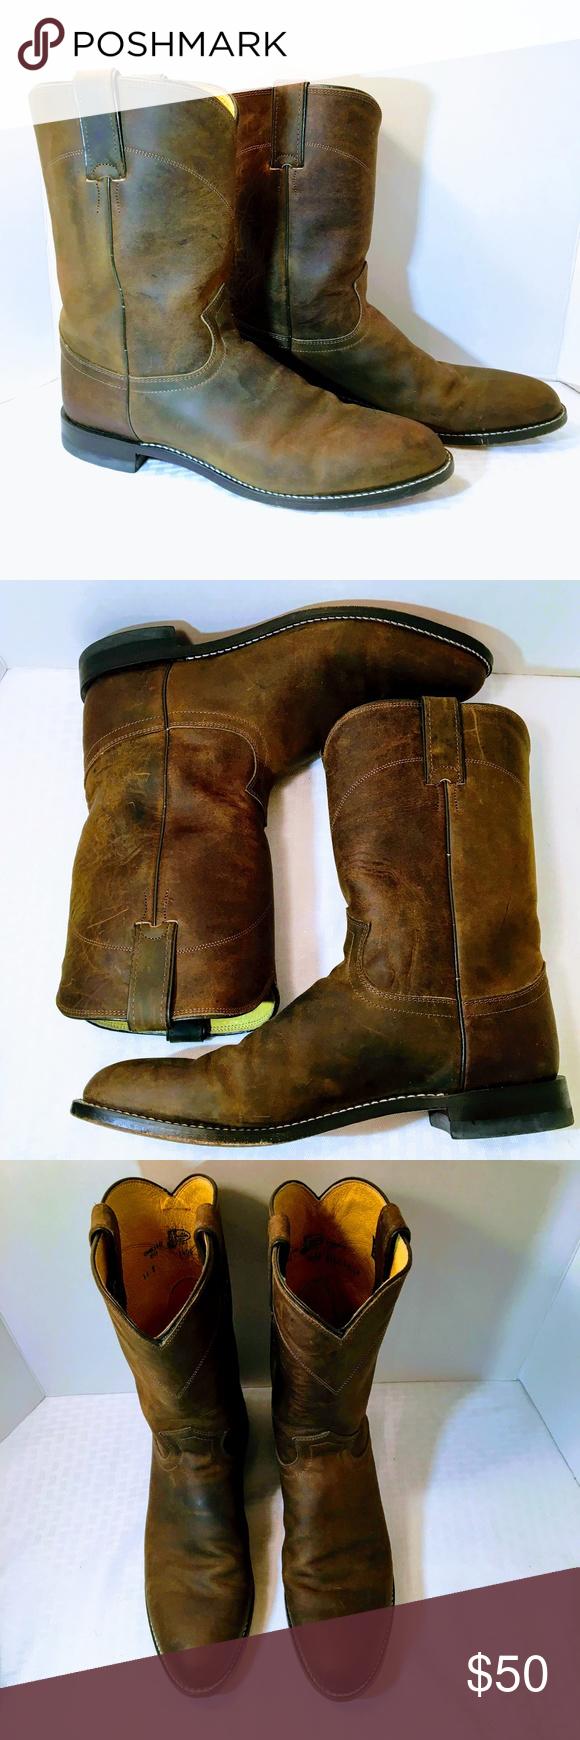 f4352176ba063 Justin Roper Bay Apache 10 inch Boot Justin Men's Classic Roper boot in Bay  Apache Cowhide